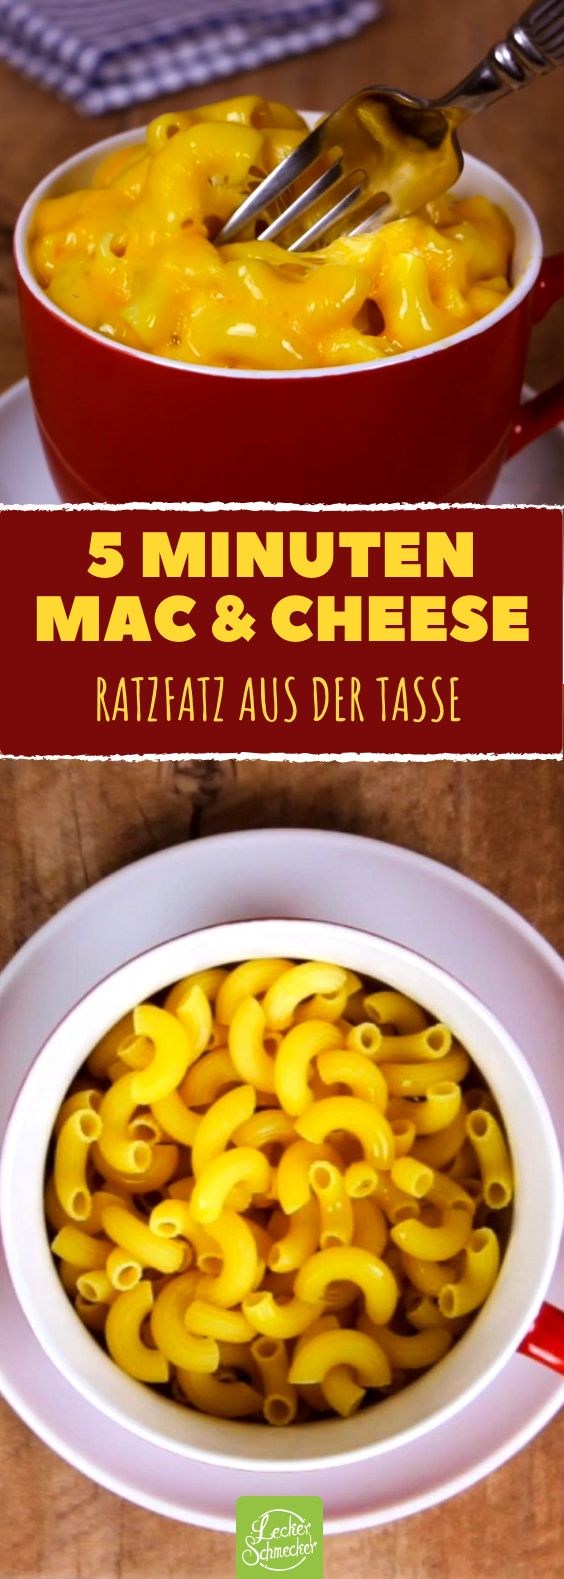 mac and cheese pasta als super schnelles tassen rezept aus der mikrowelle rezepte k senudeln. Black Bedroom Furniture Sets. Home Design Ideas